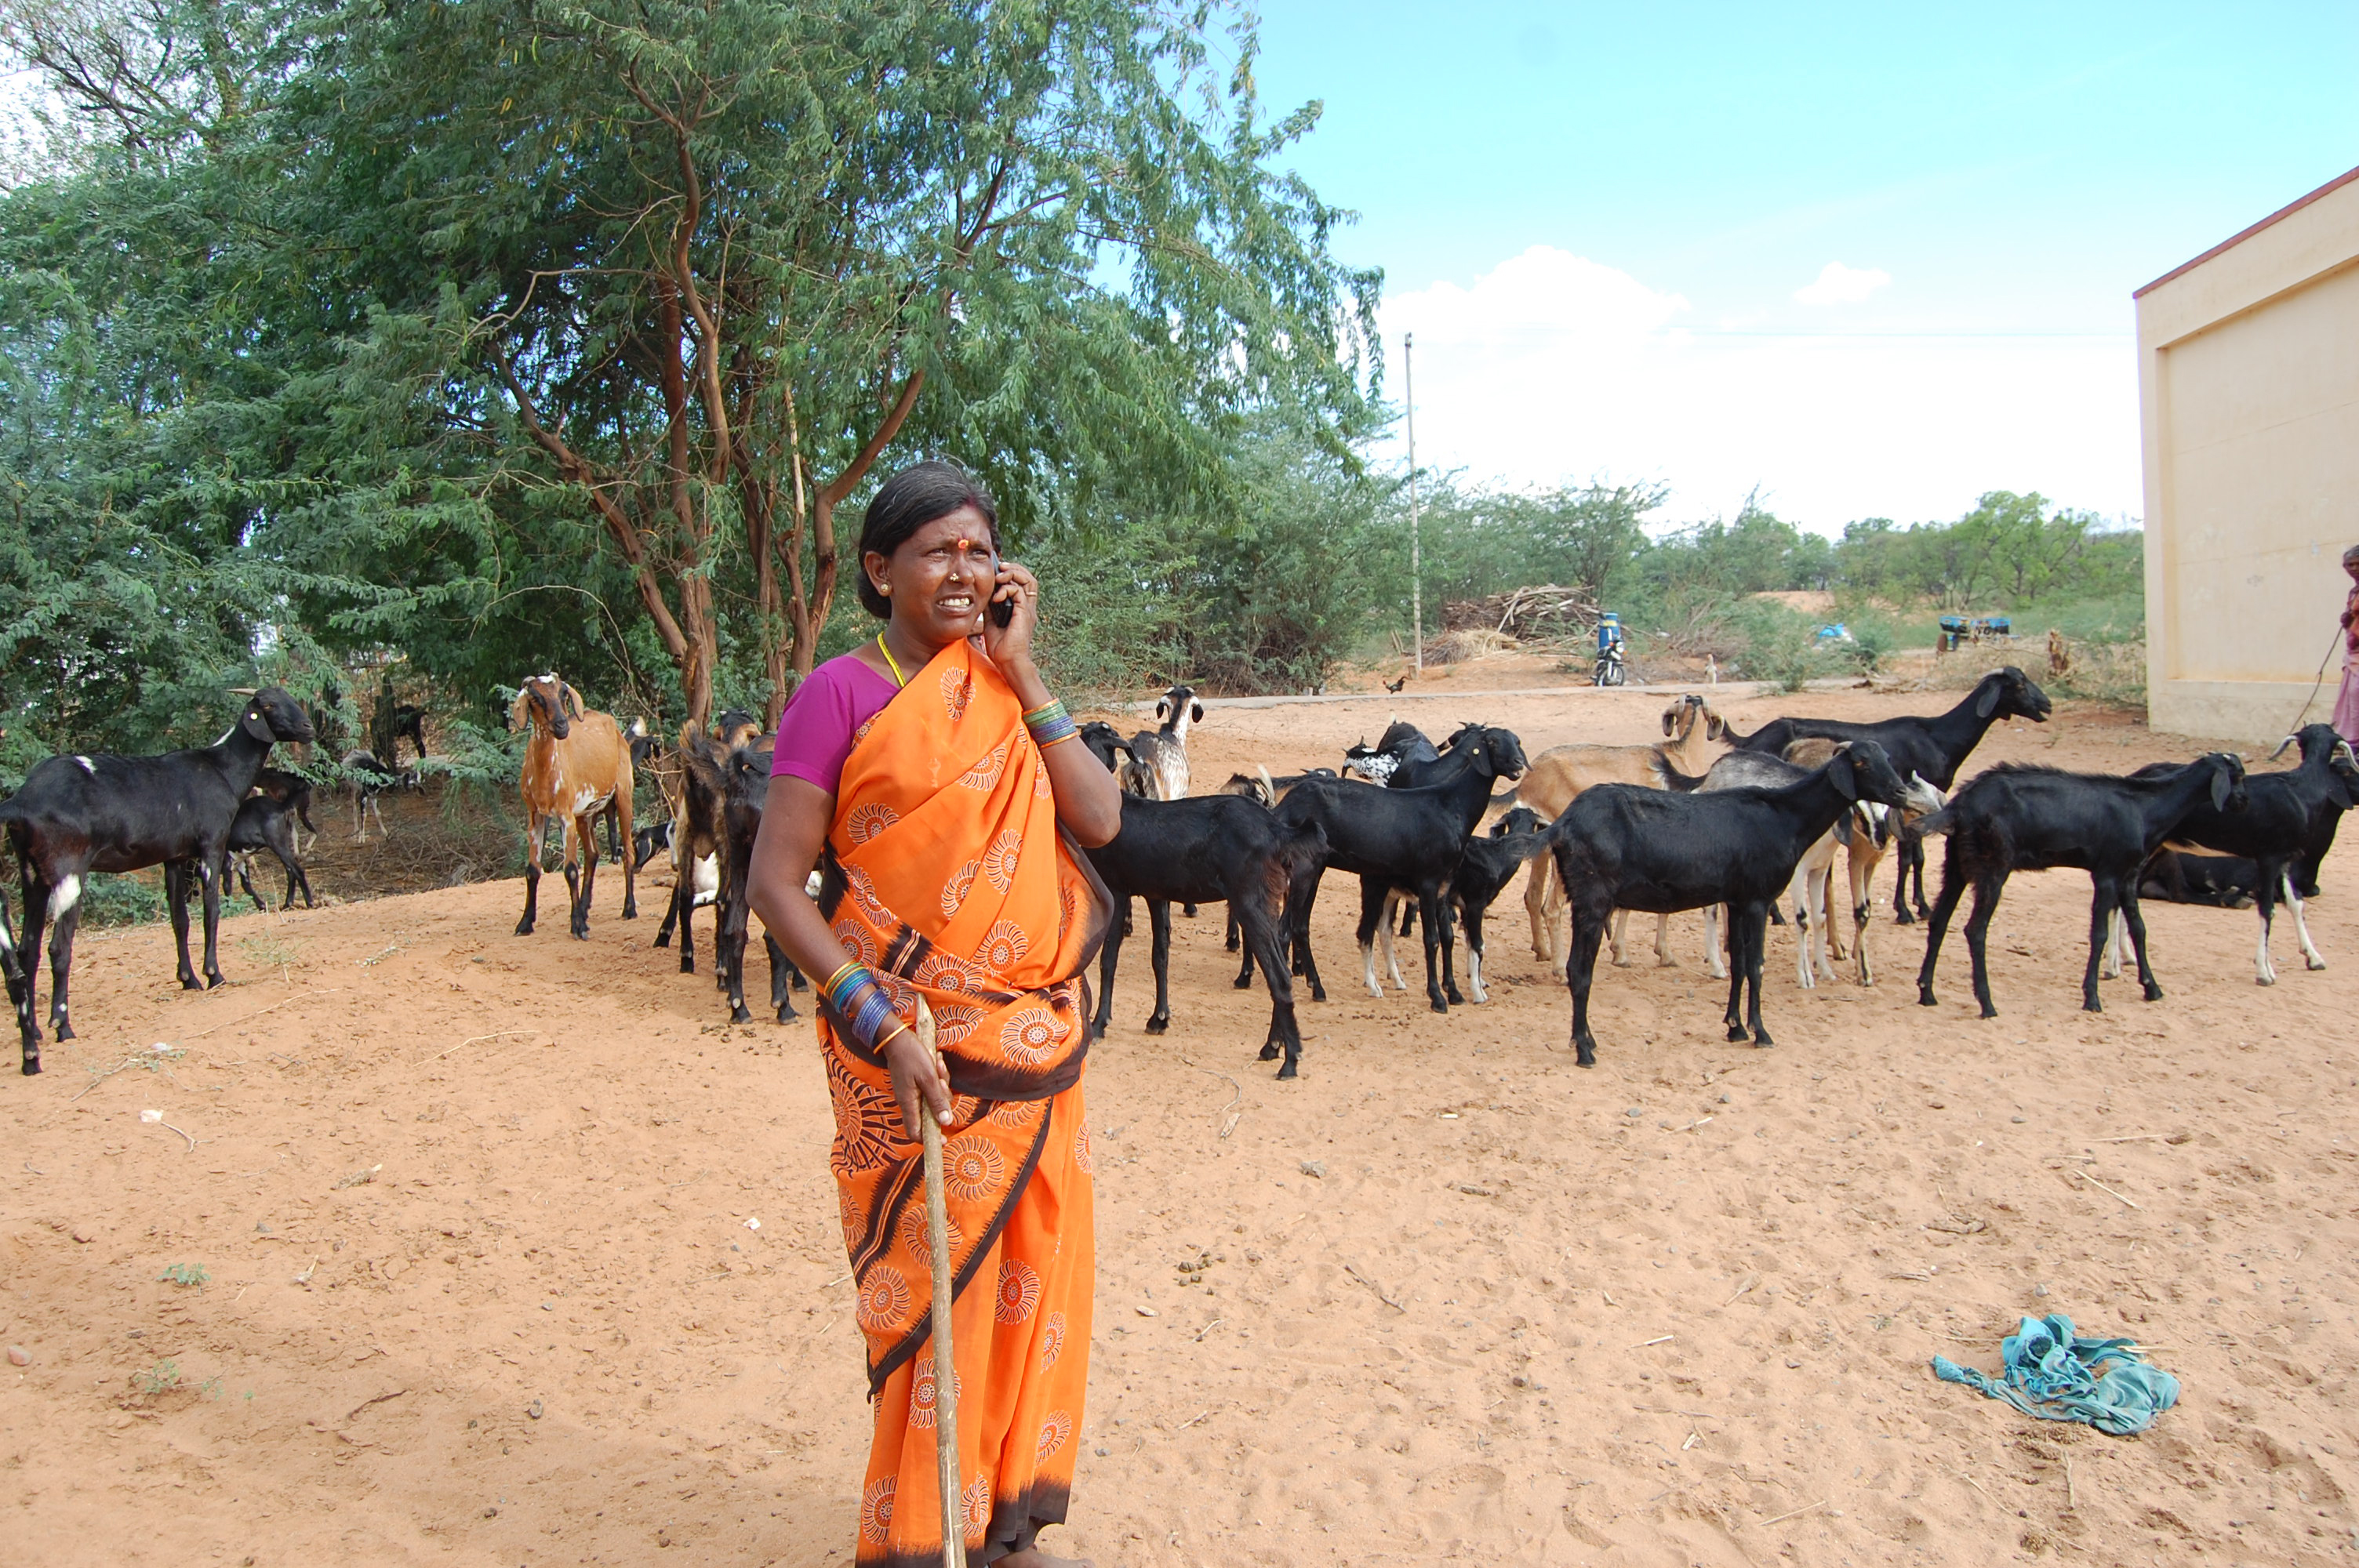 Theni Jakhammal using her mobile phone_6459818213_o